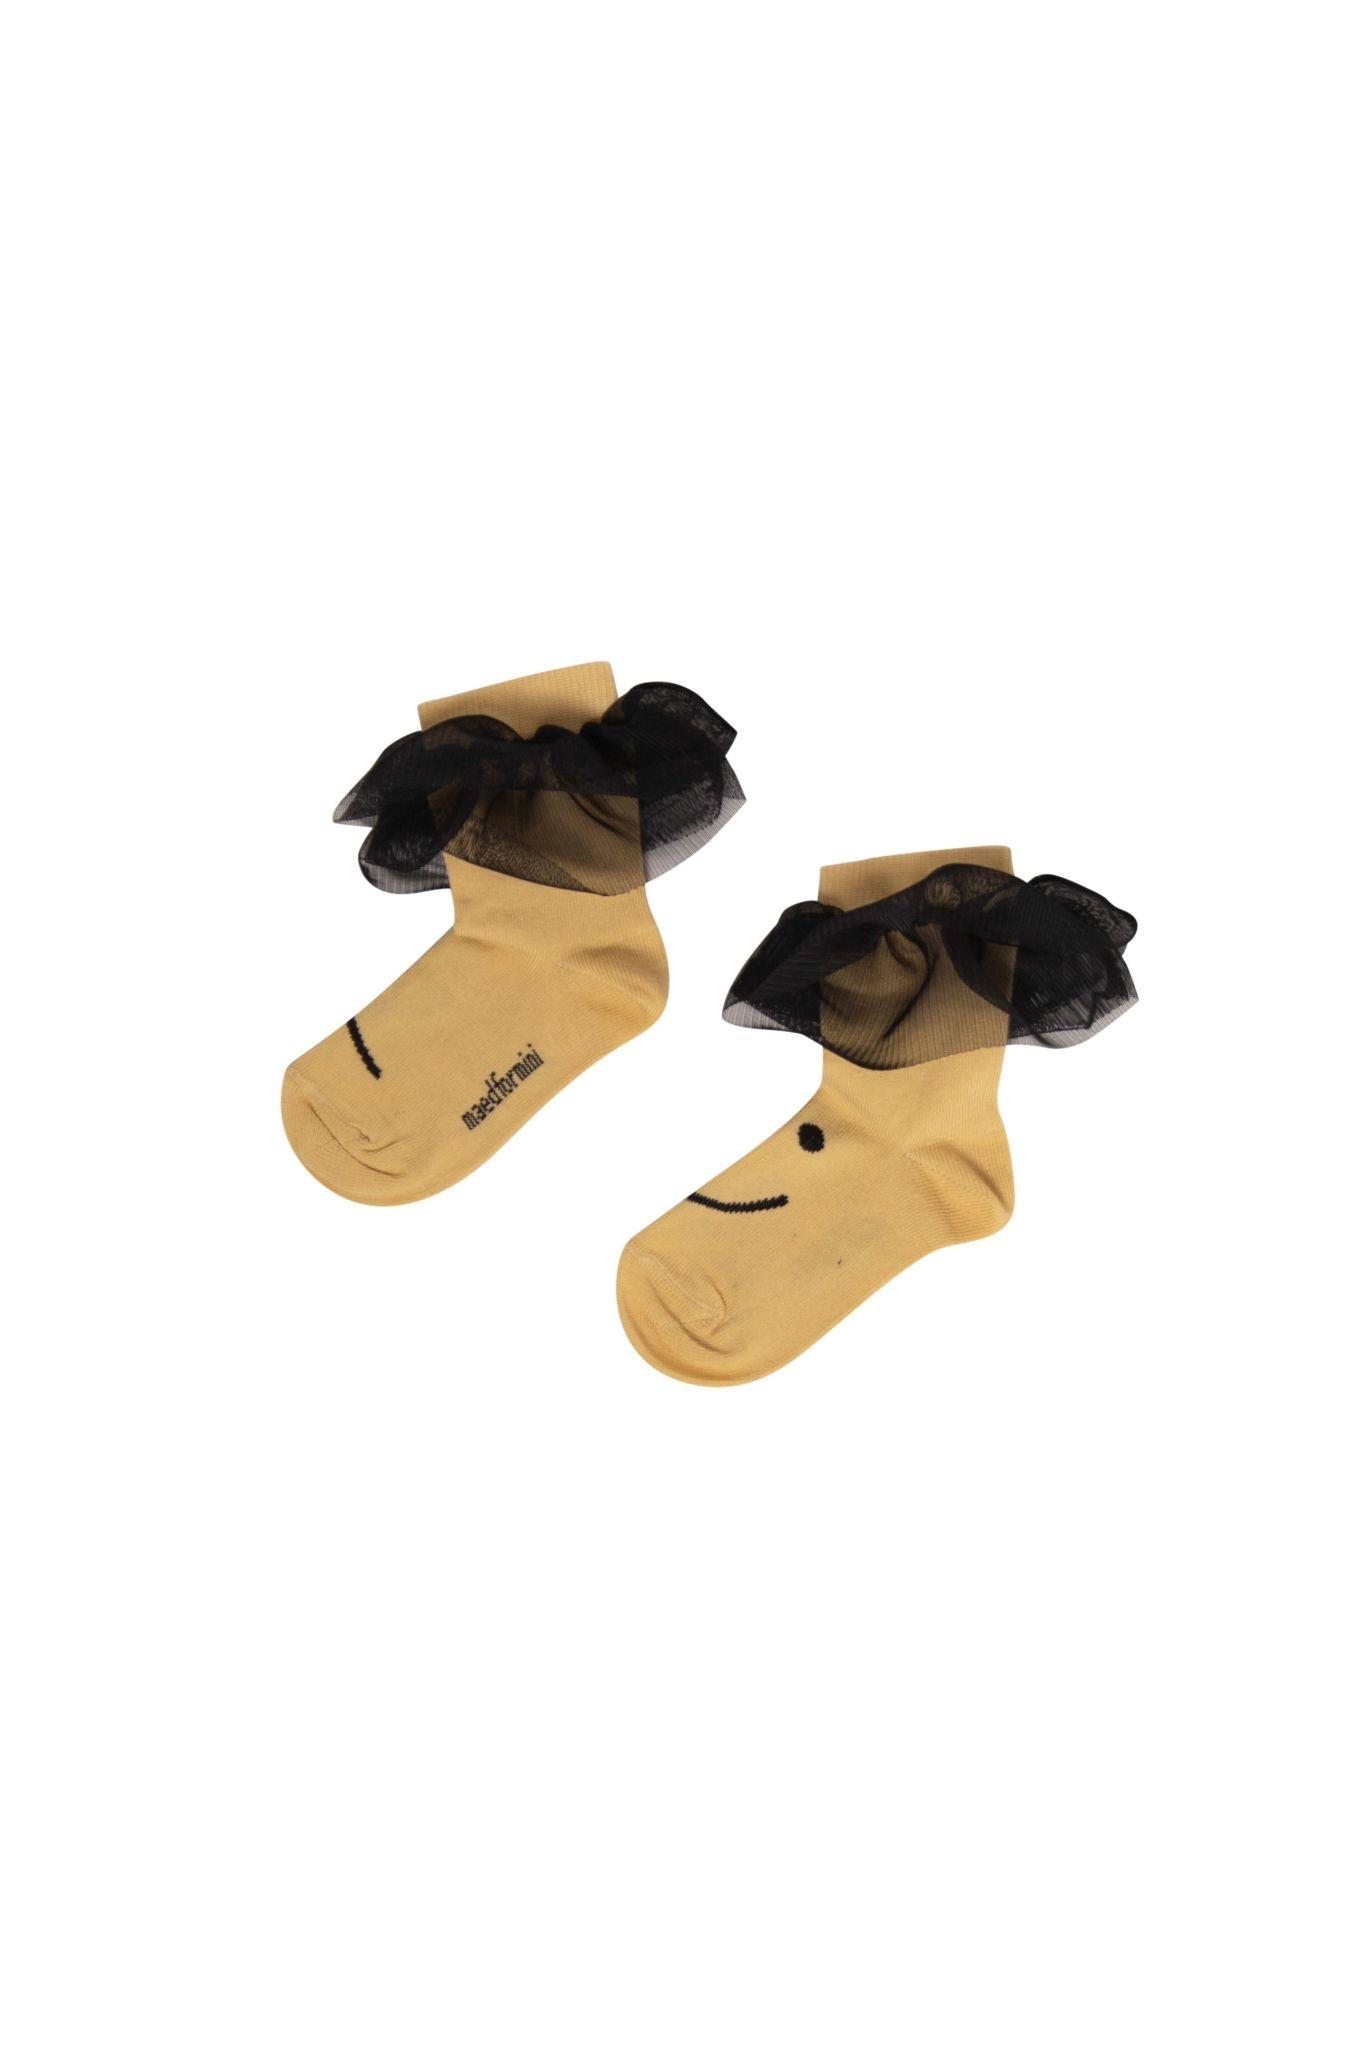 Maed For mini Maed for mini - Smiling sun socks